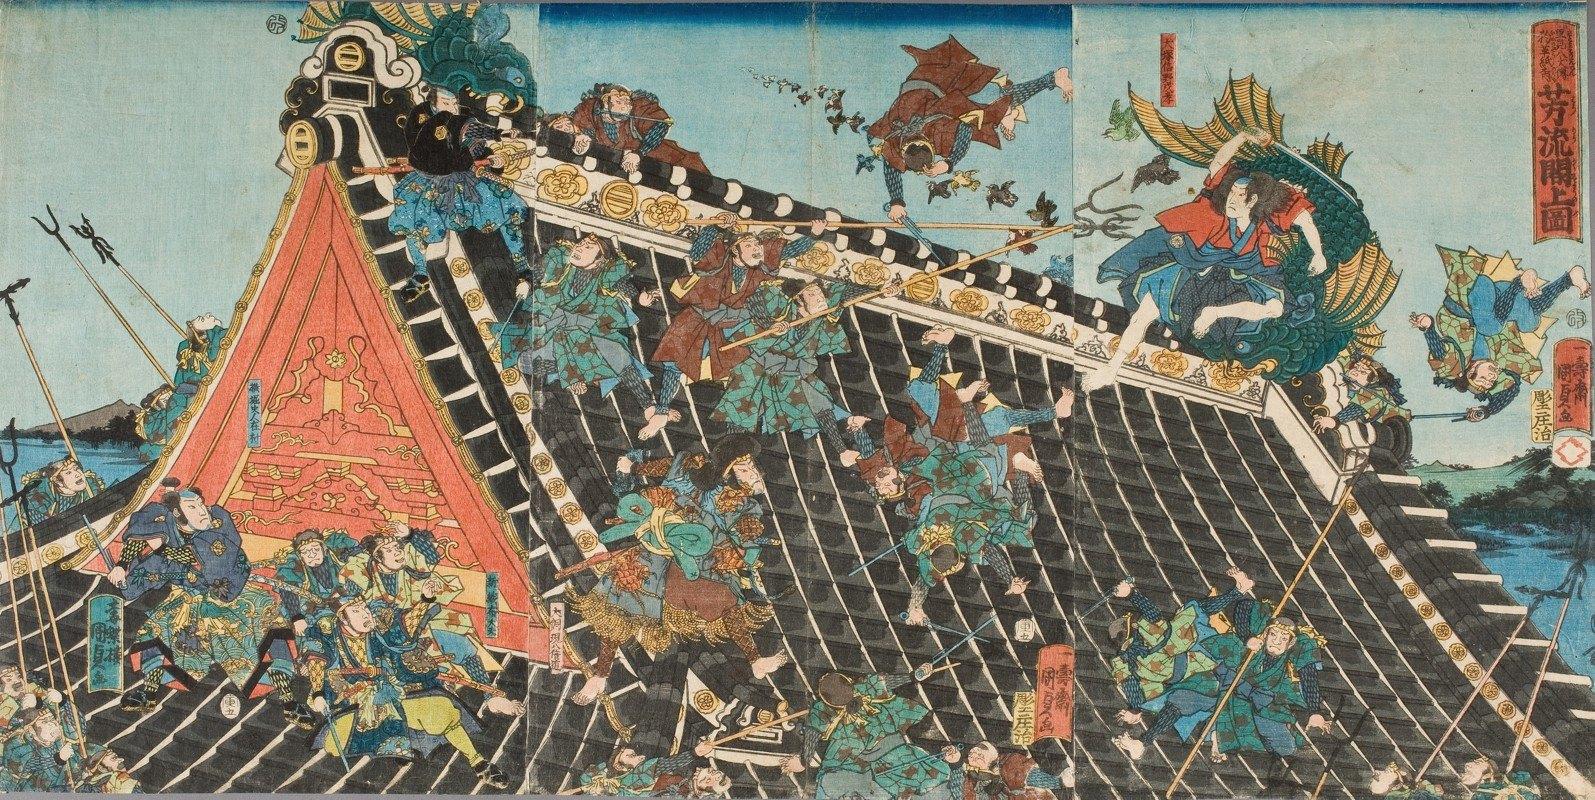 Utagawa Kunisada II - Battle on roof of Hōryūkaku, from the Play 'Tale of the Eight Dogs' (Hakkenden)